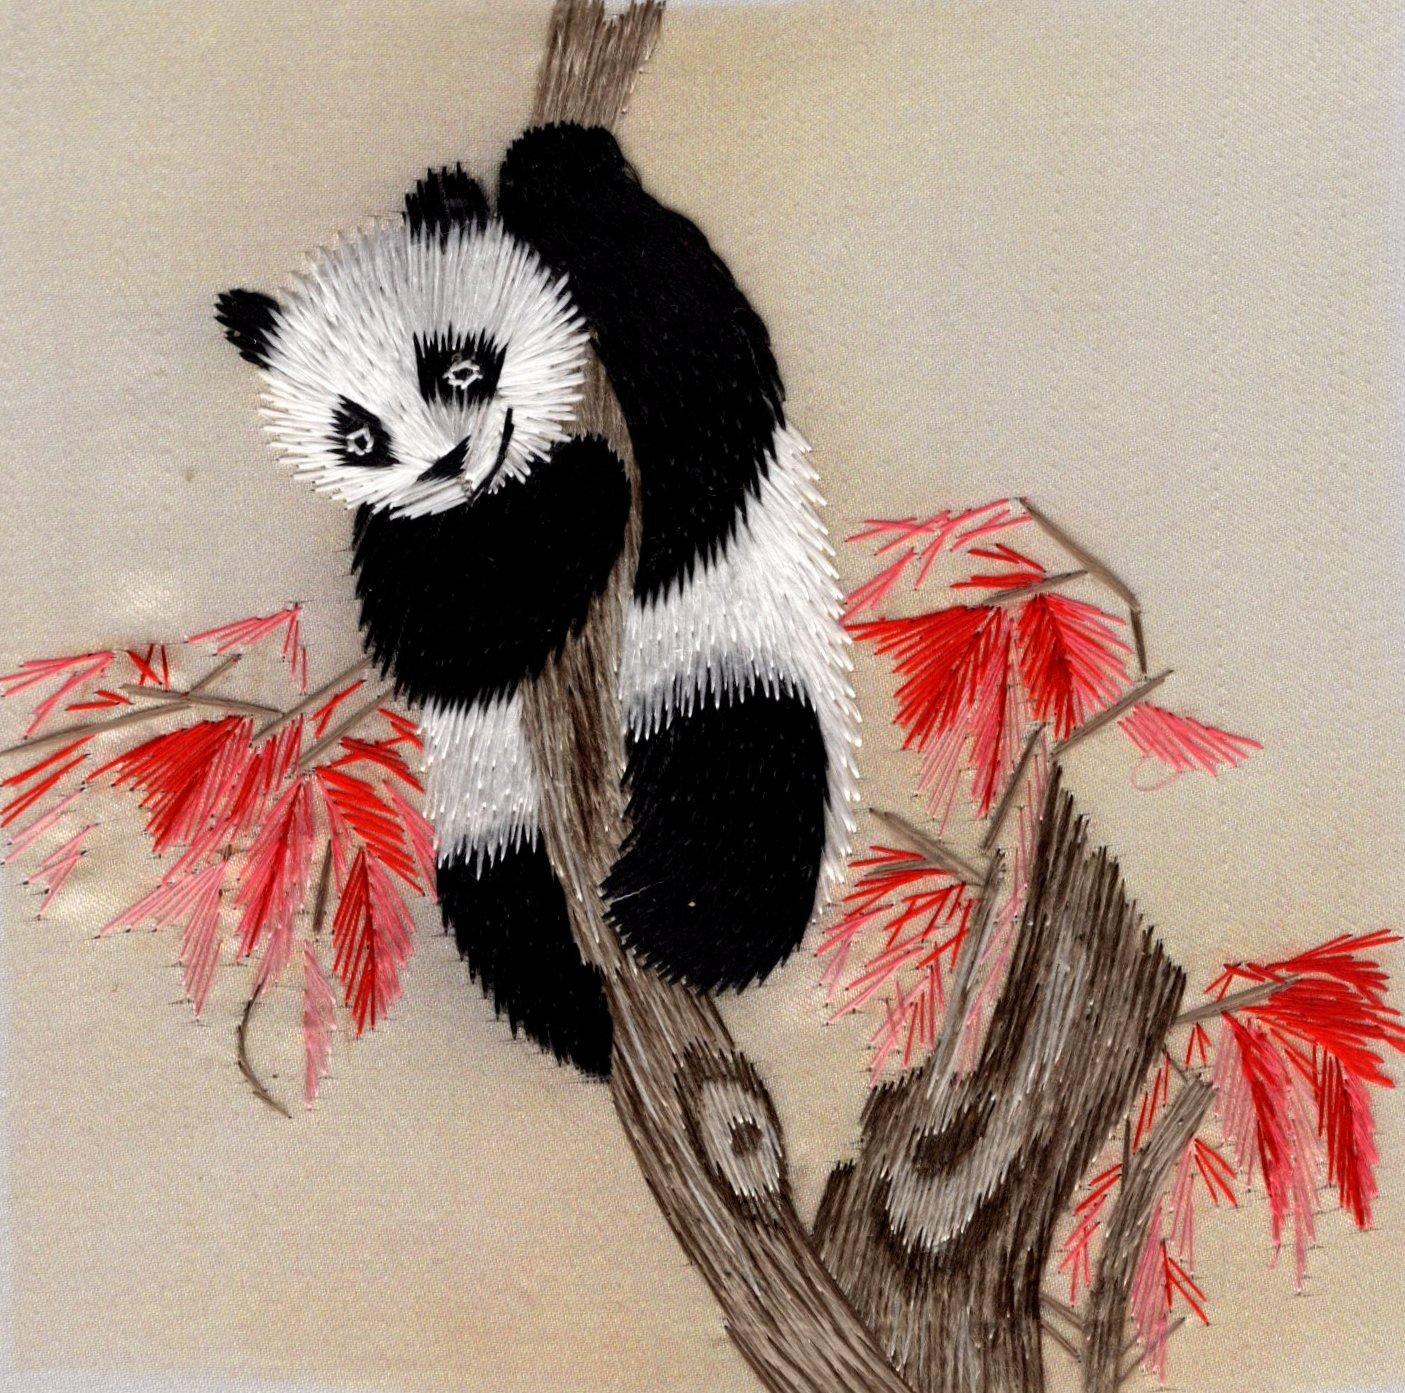 Chinese Silk Embroidery Art Handmade Chinese Giant Panda Bear Decor Handicraft